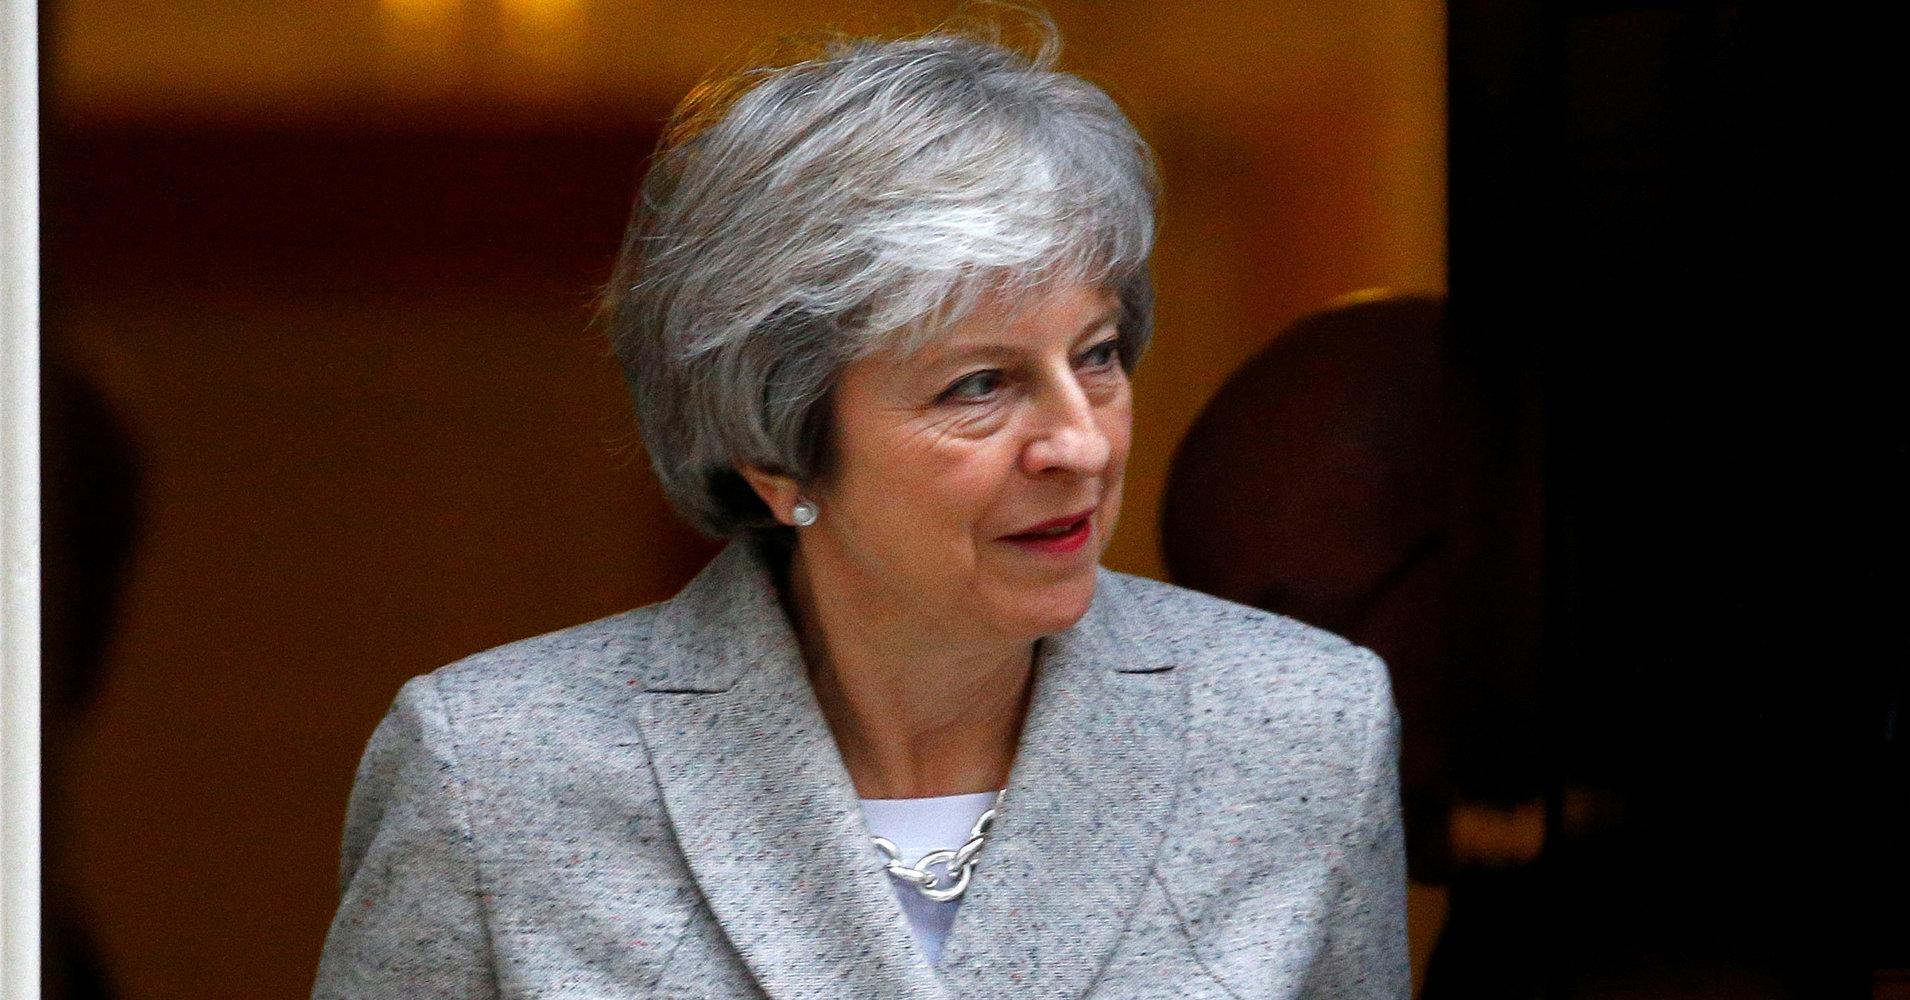 UK Prime Minister Theresa May Announces Brexit Deal Postponement